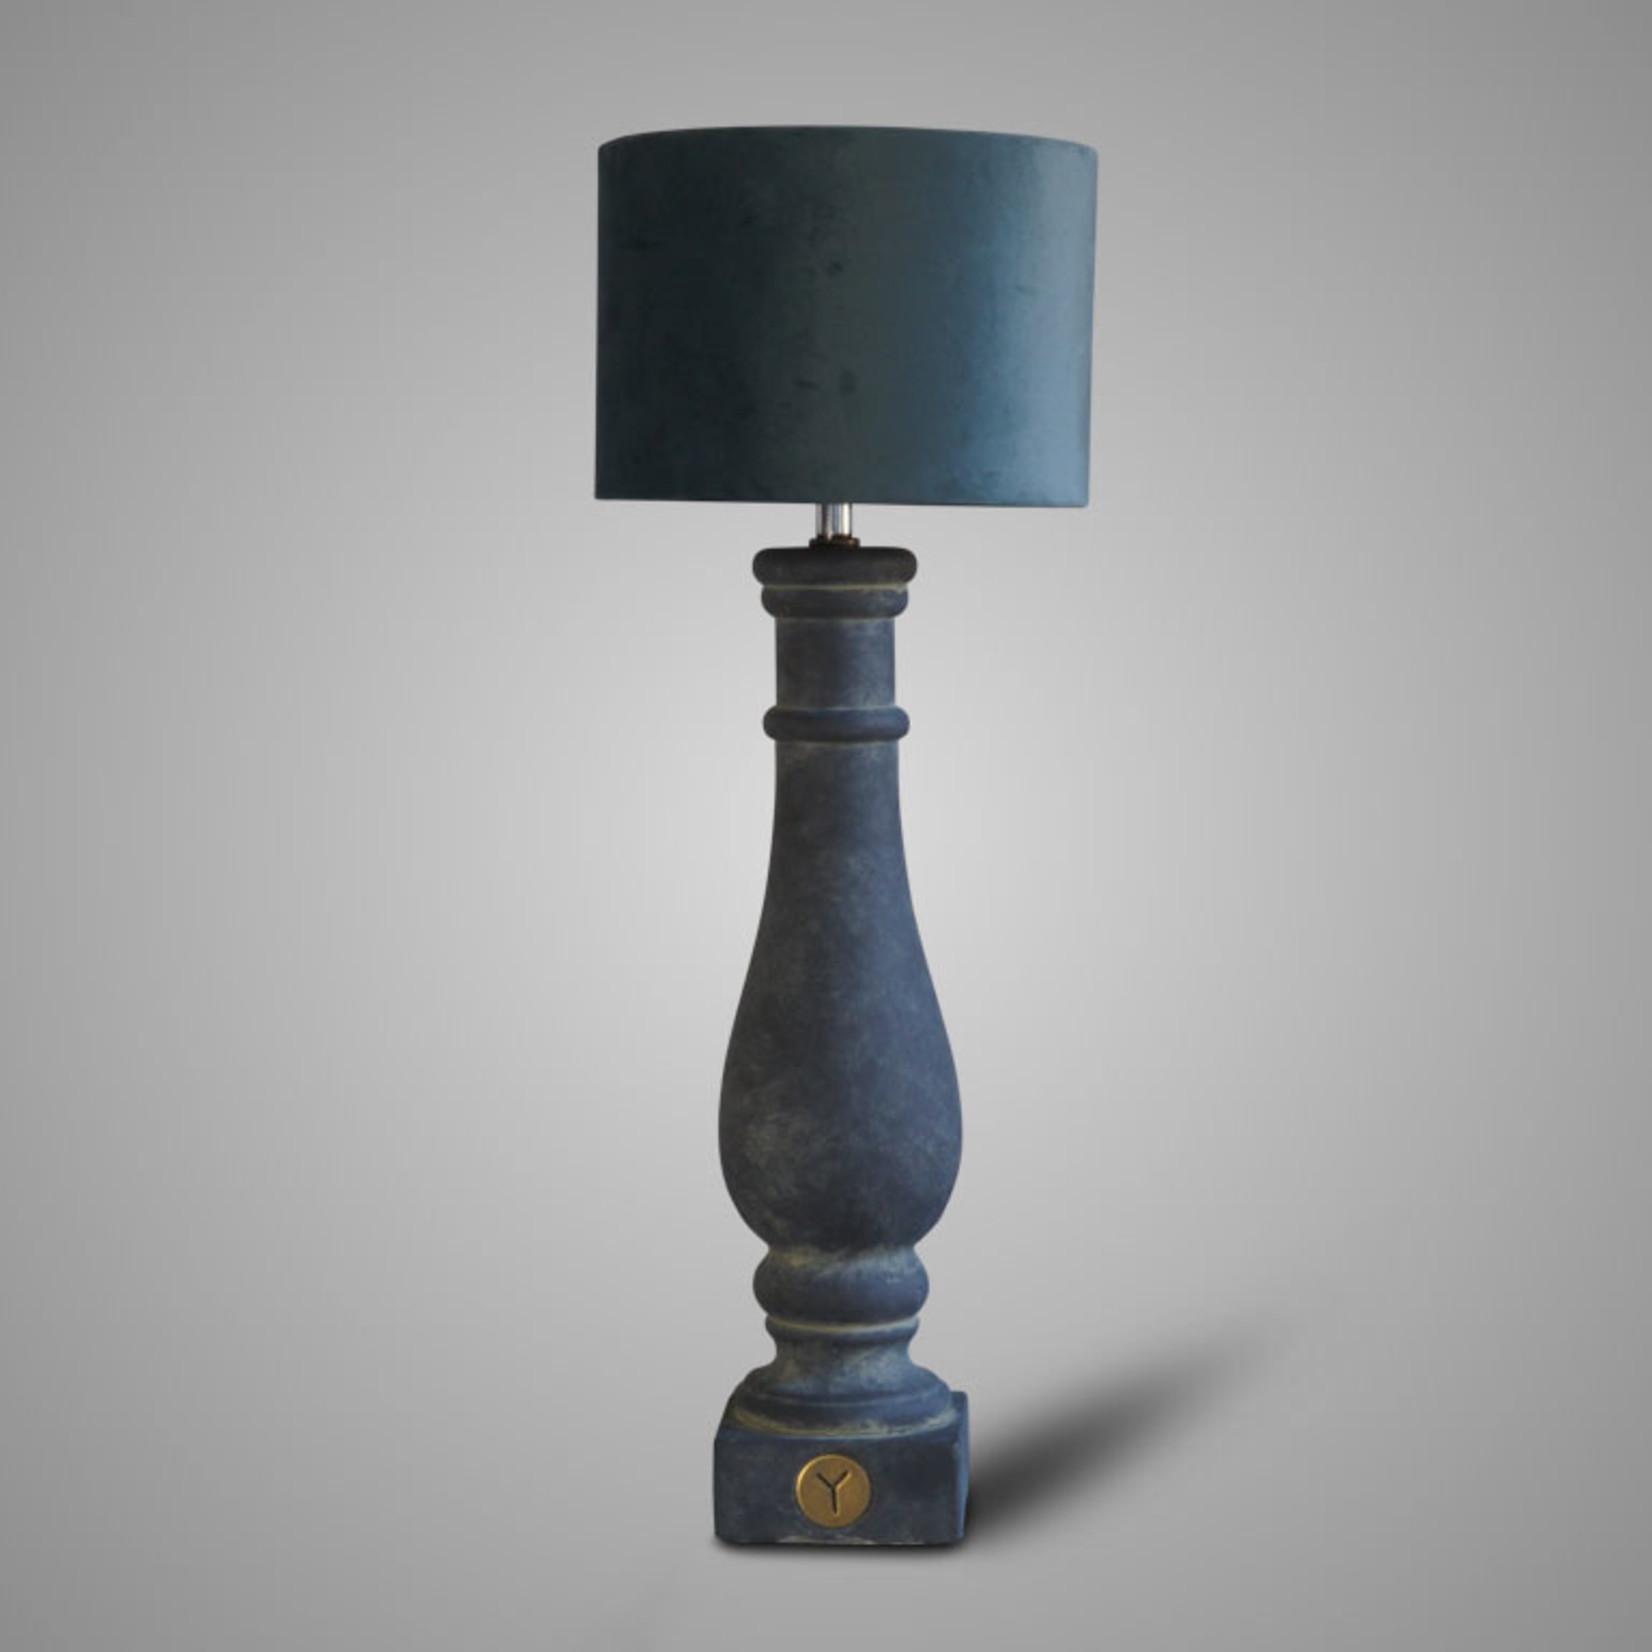 Brynxz Brynxz Lamp Table Tall Majestic Vintage M